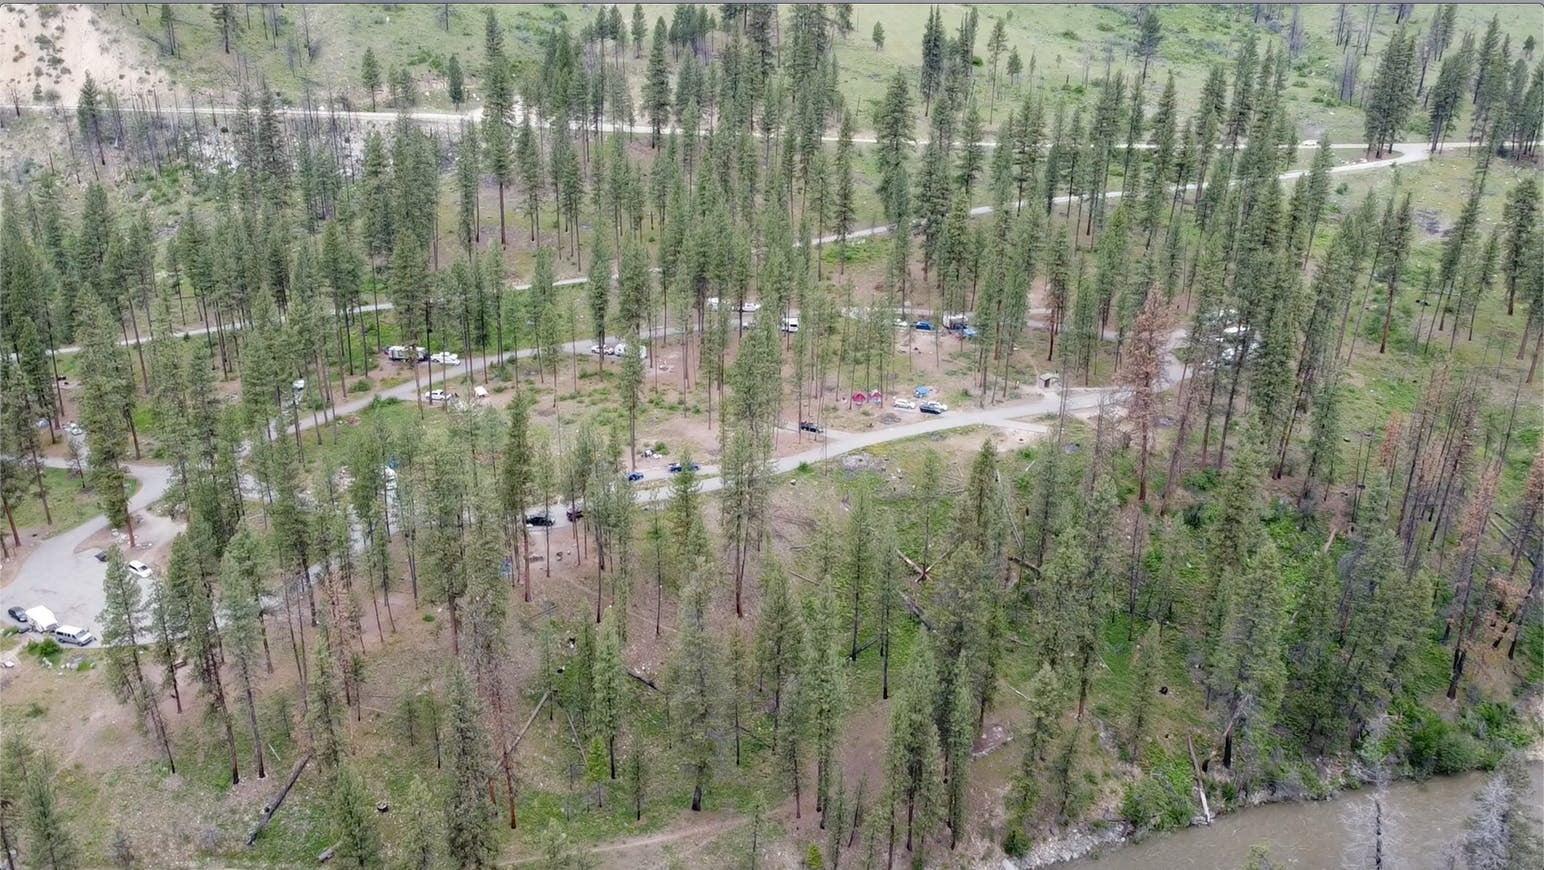 Aerial image of Pine Flats Campground, Idaho.